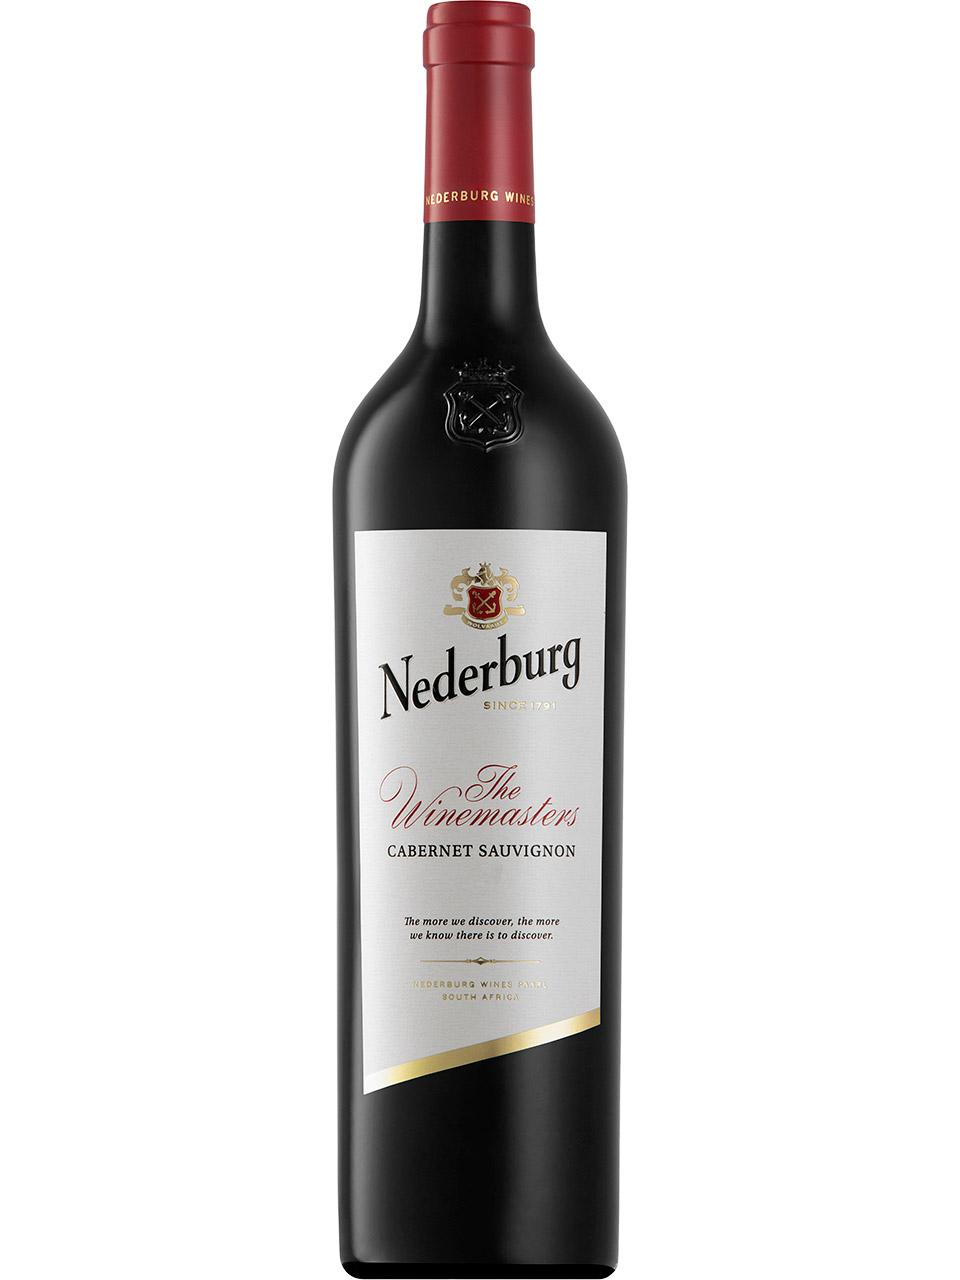 Nederburg The Winemaster's Cabernet Sauvignon